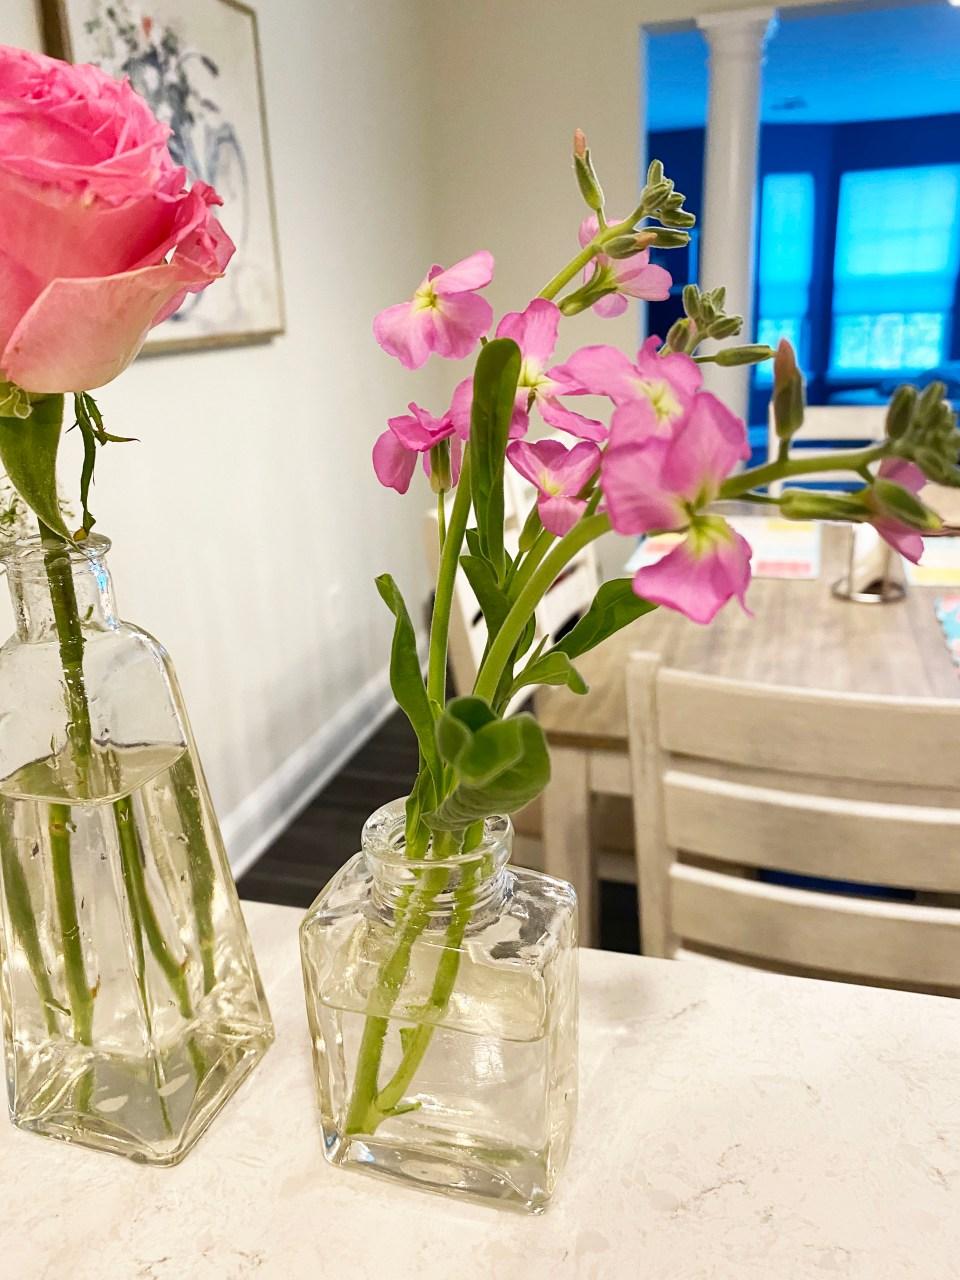 Miniature Vases 4